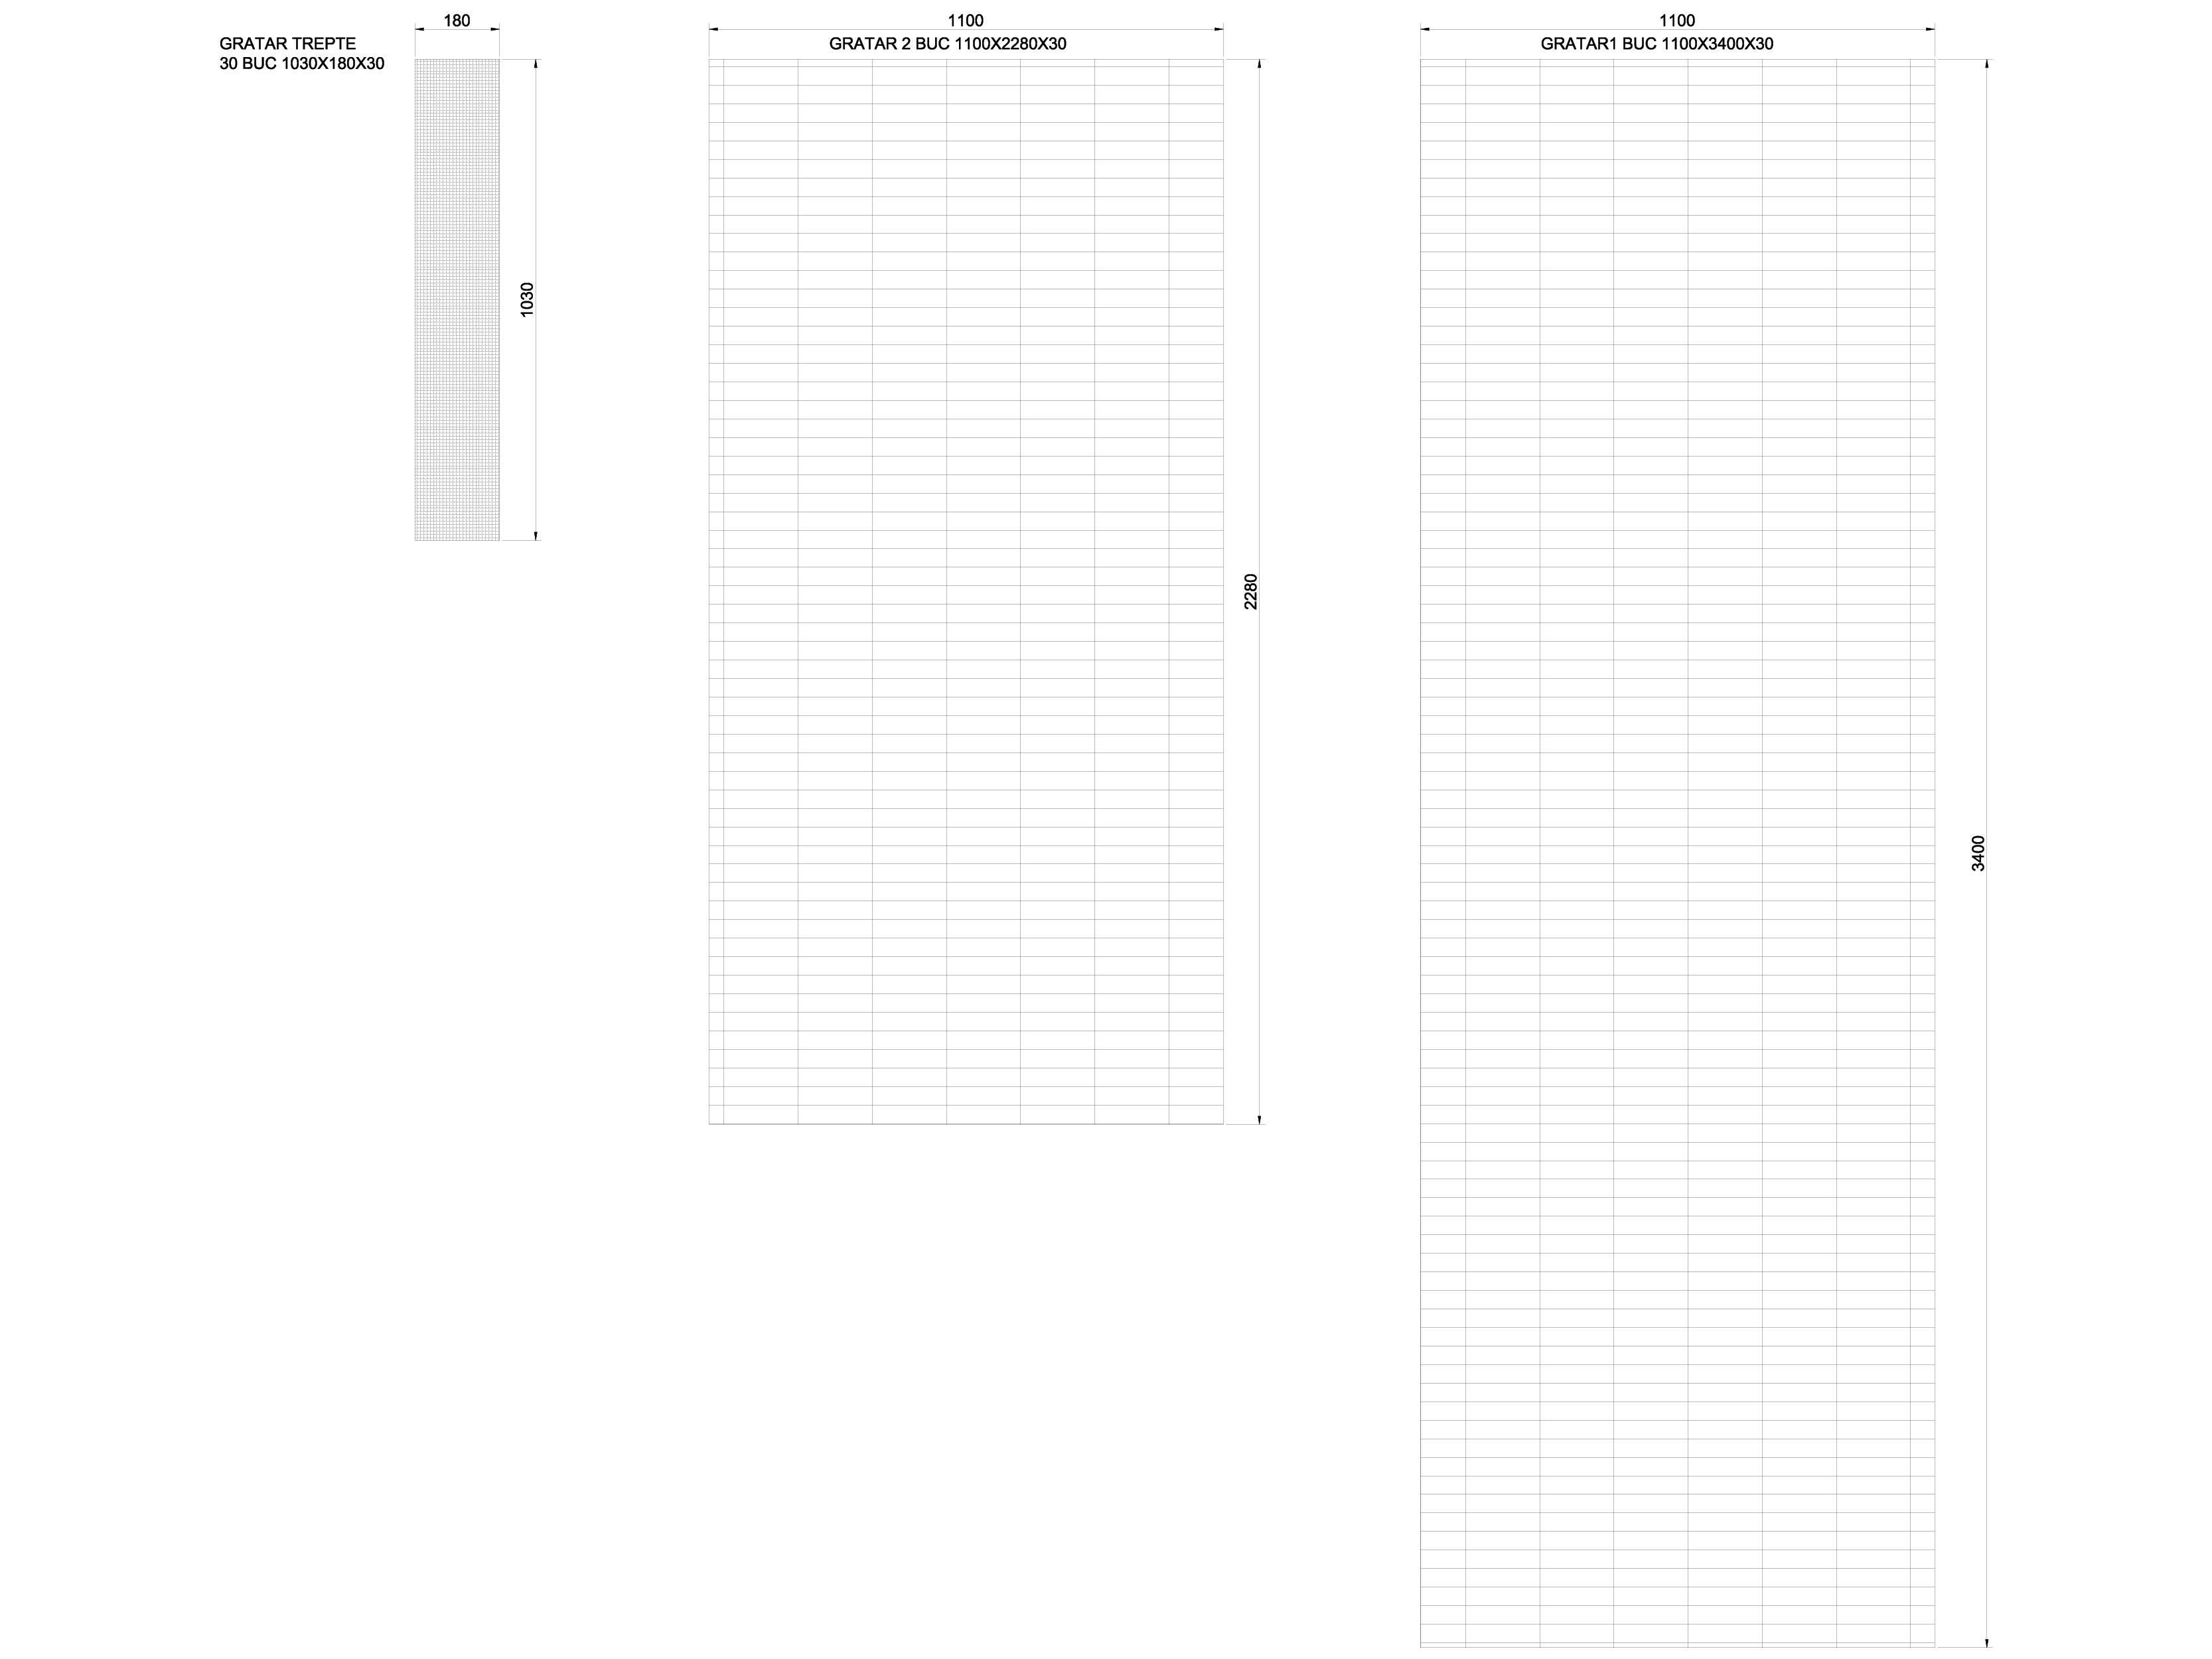 Pagina 1 - CAD-DWG Gratare GRIRO Detaliu de produs TIP 1, TIP 2, TIP 3, TIP 4